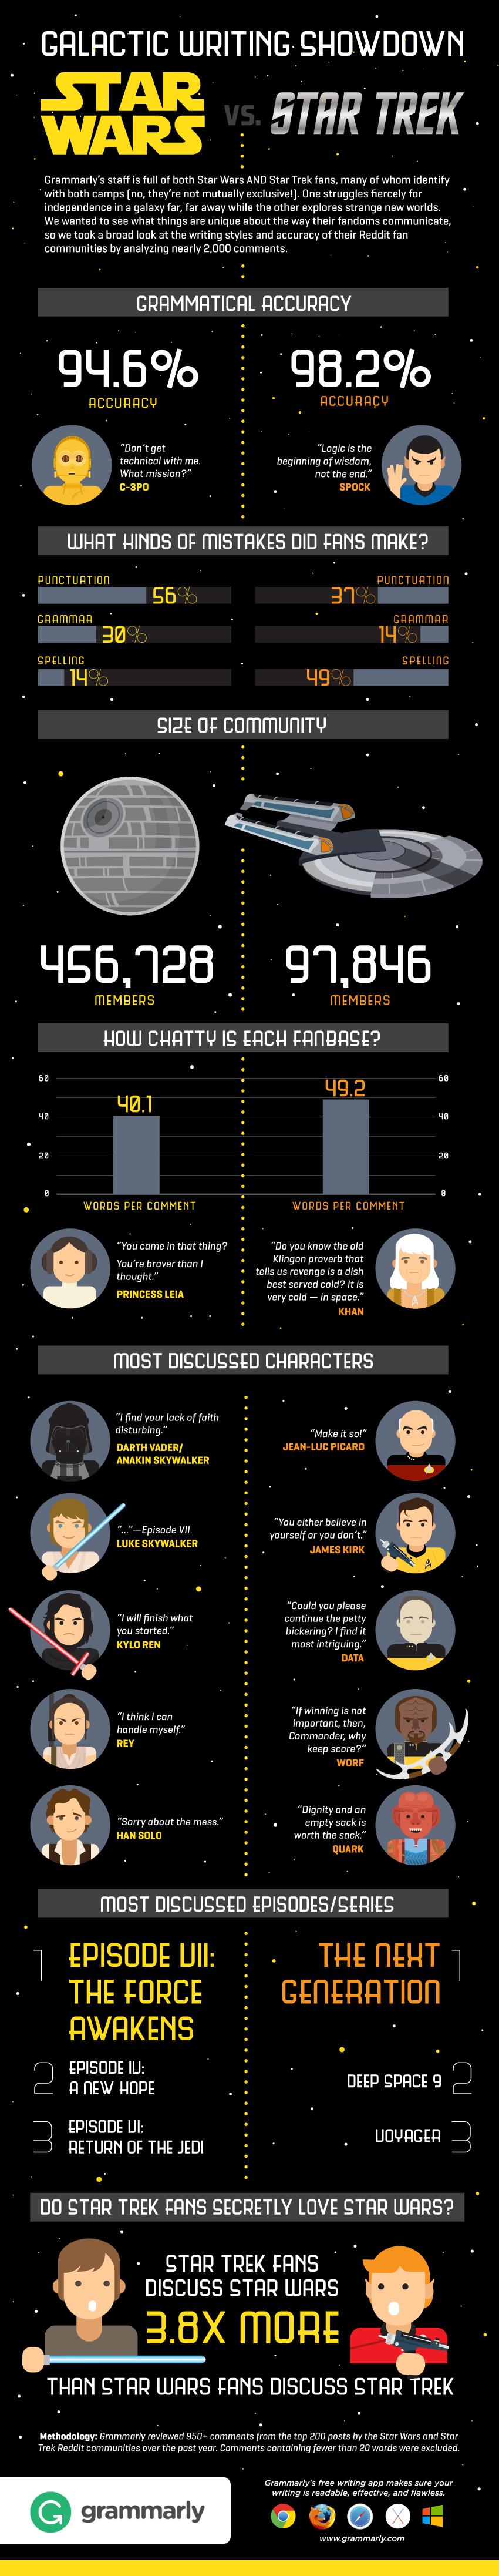 Galactic Writing Showdown Infographic